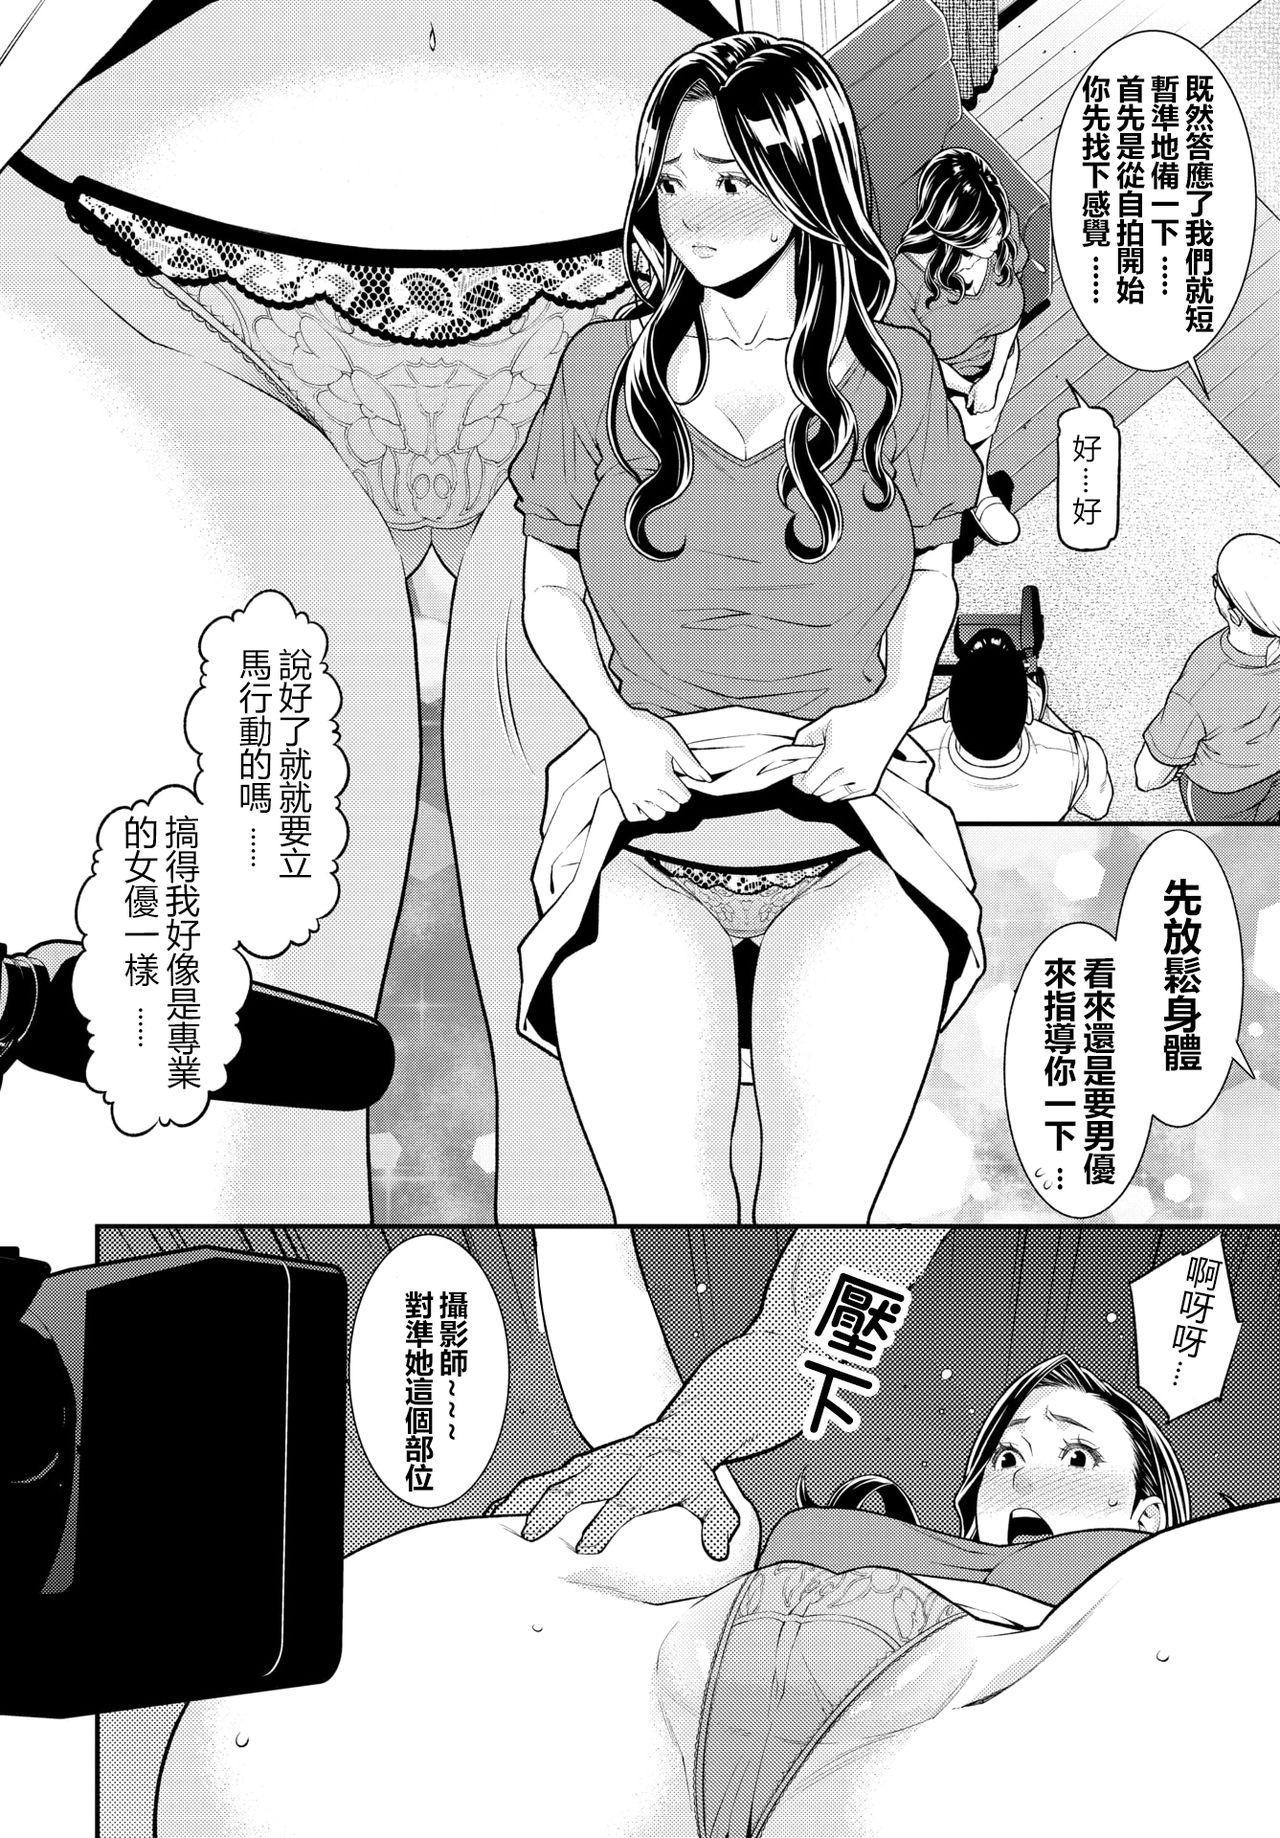 [Syuuen] Secret Wife  1-6 [Chinese][鼠灣漢化](210206最新修复完整版)【極品人妻NTR】 54